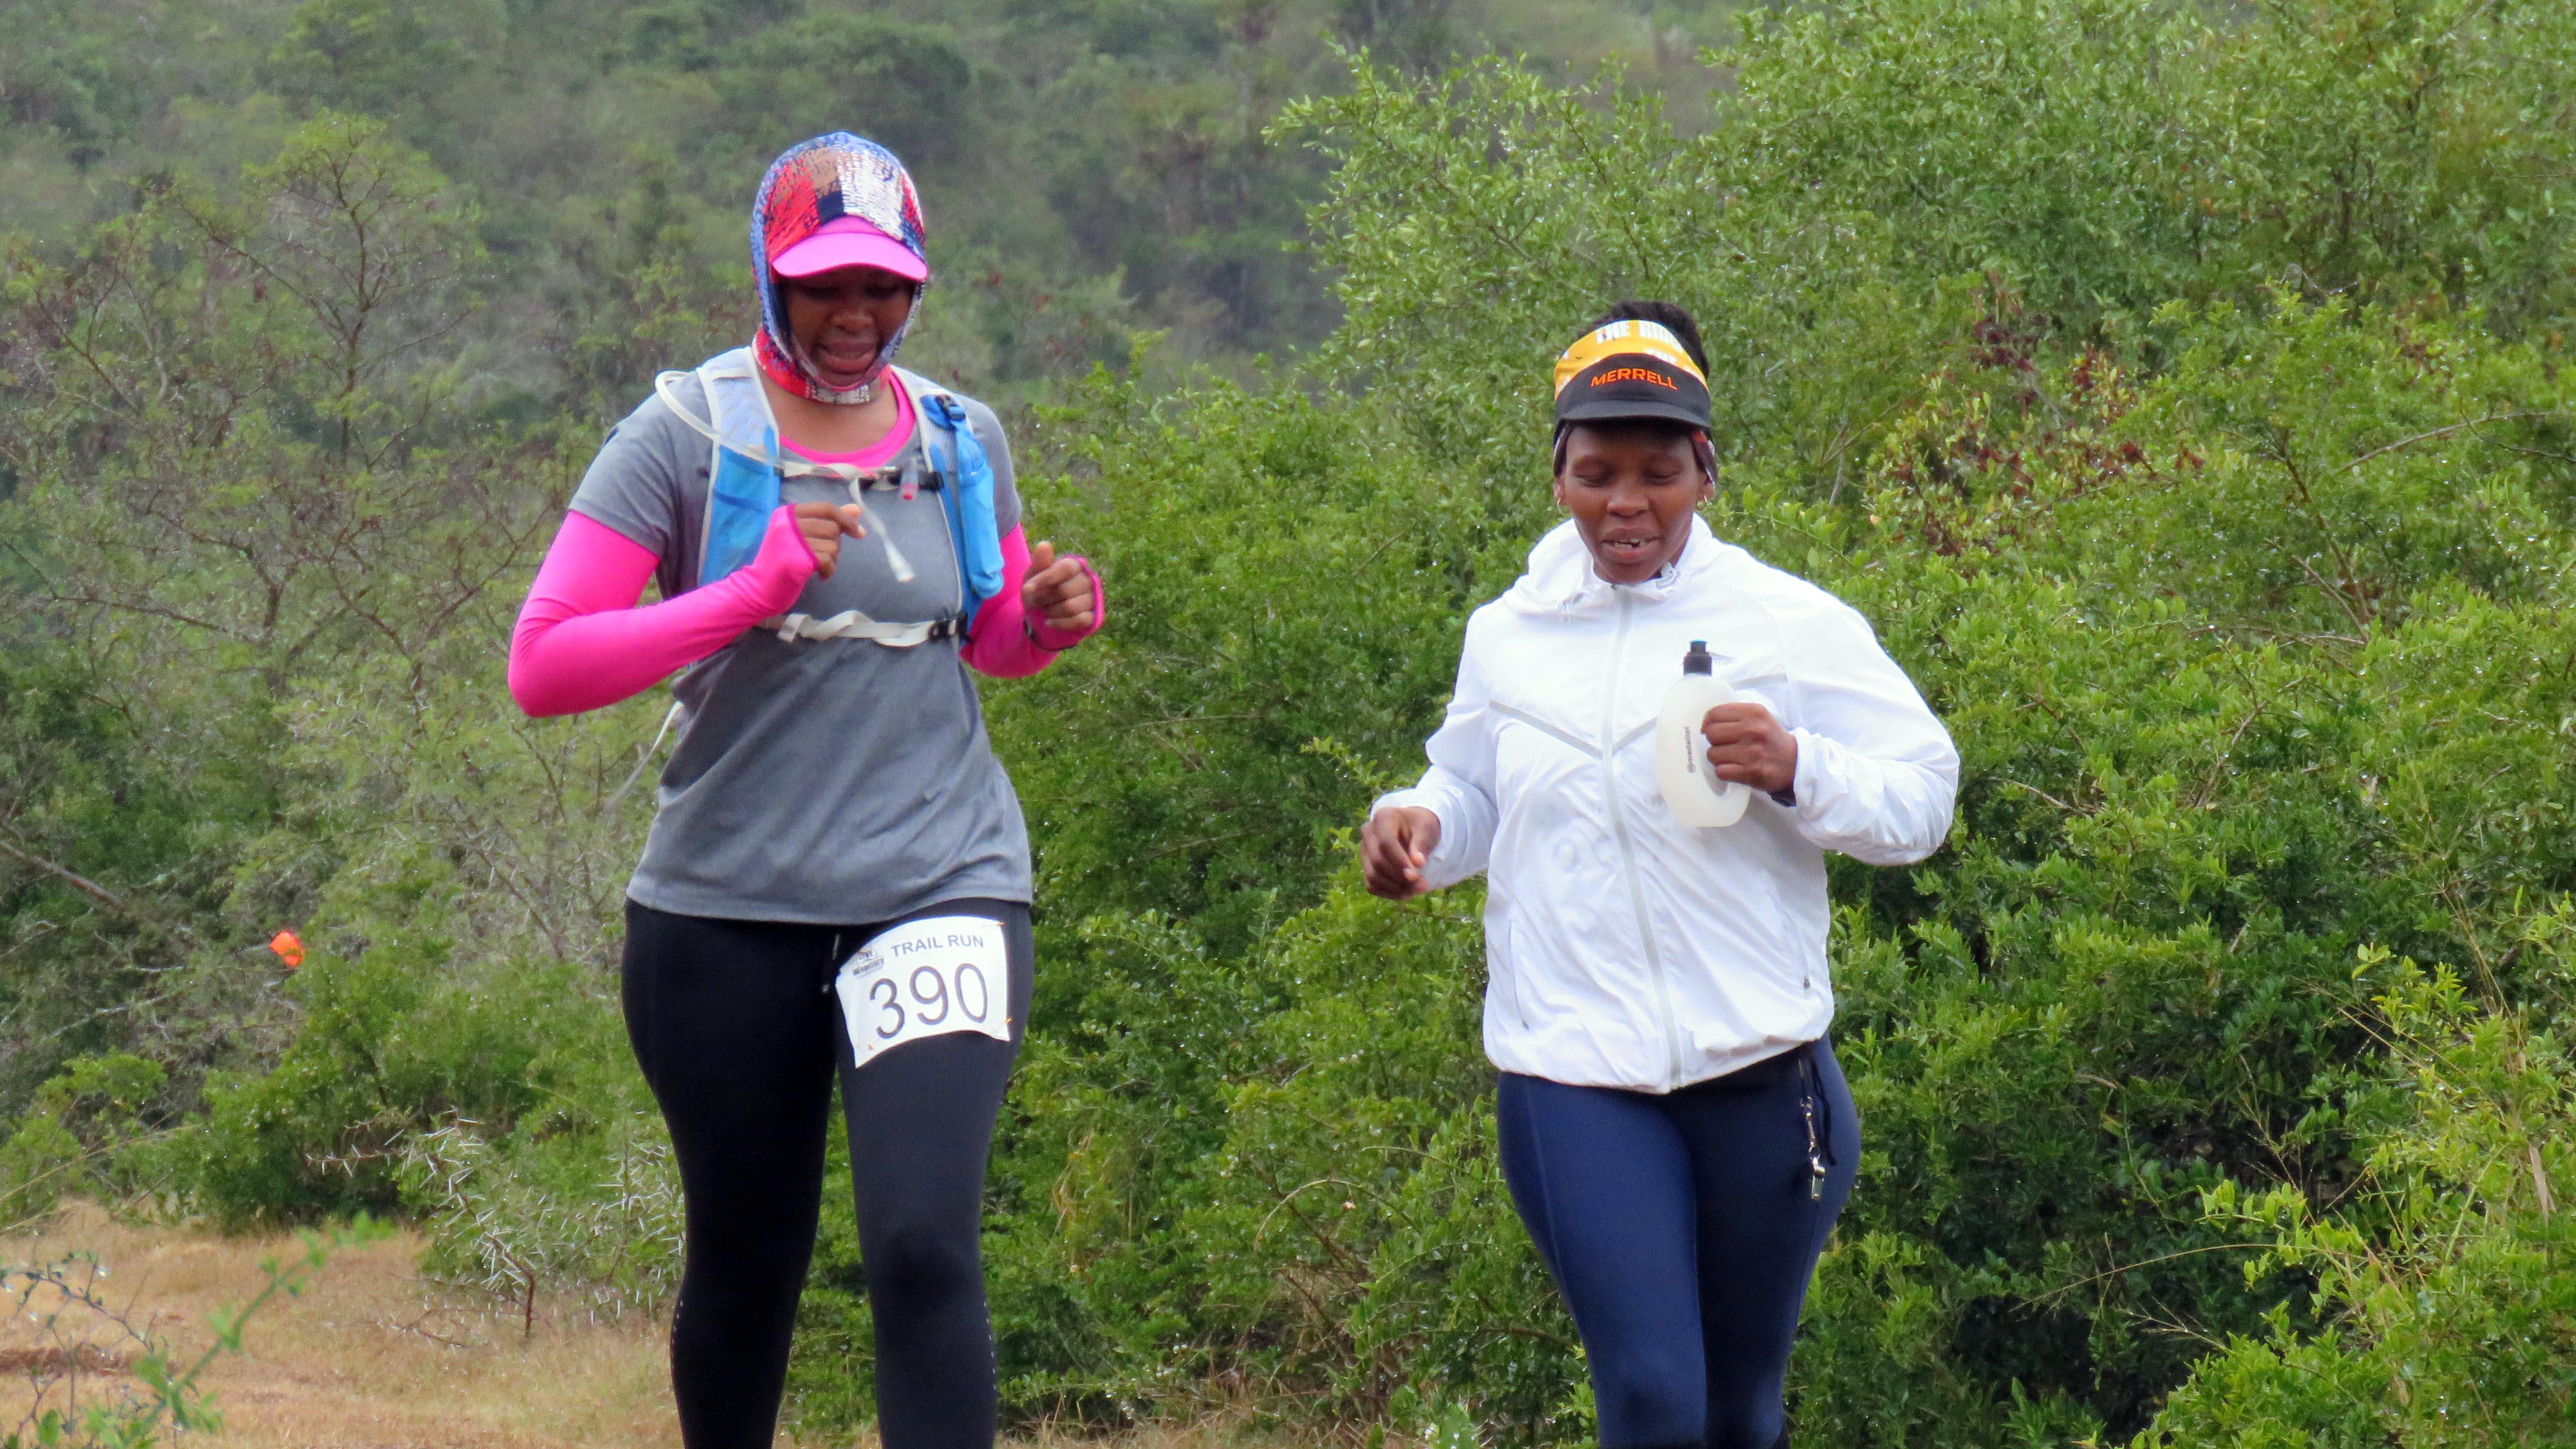 hayterdale trailrun 2018-08-05  (25)